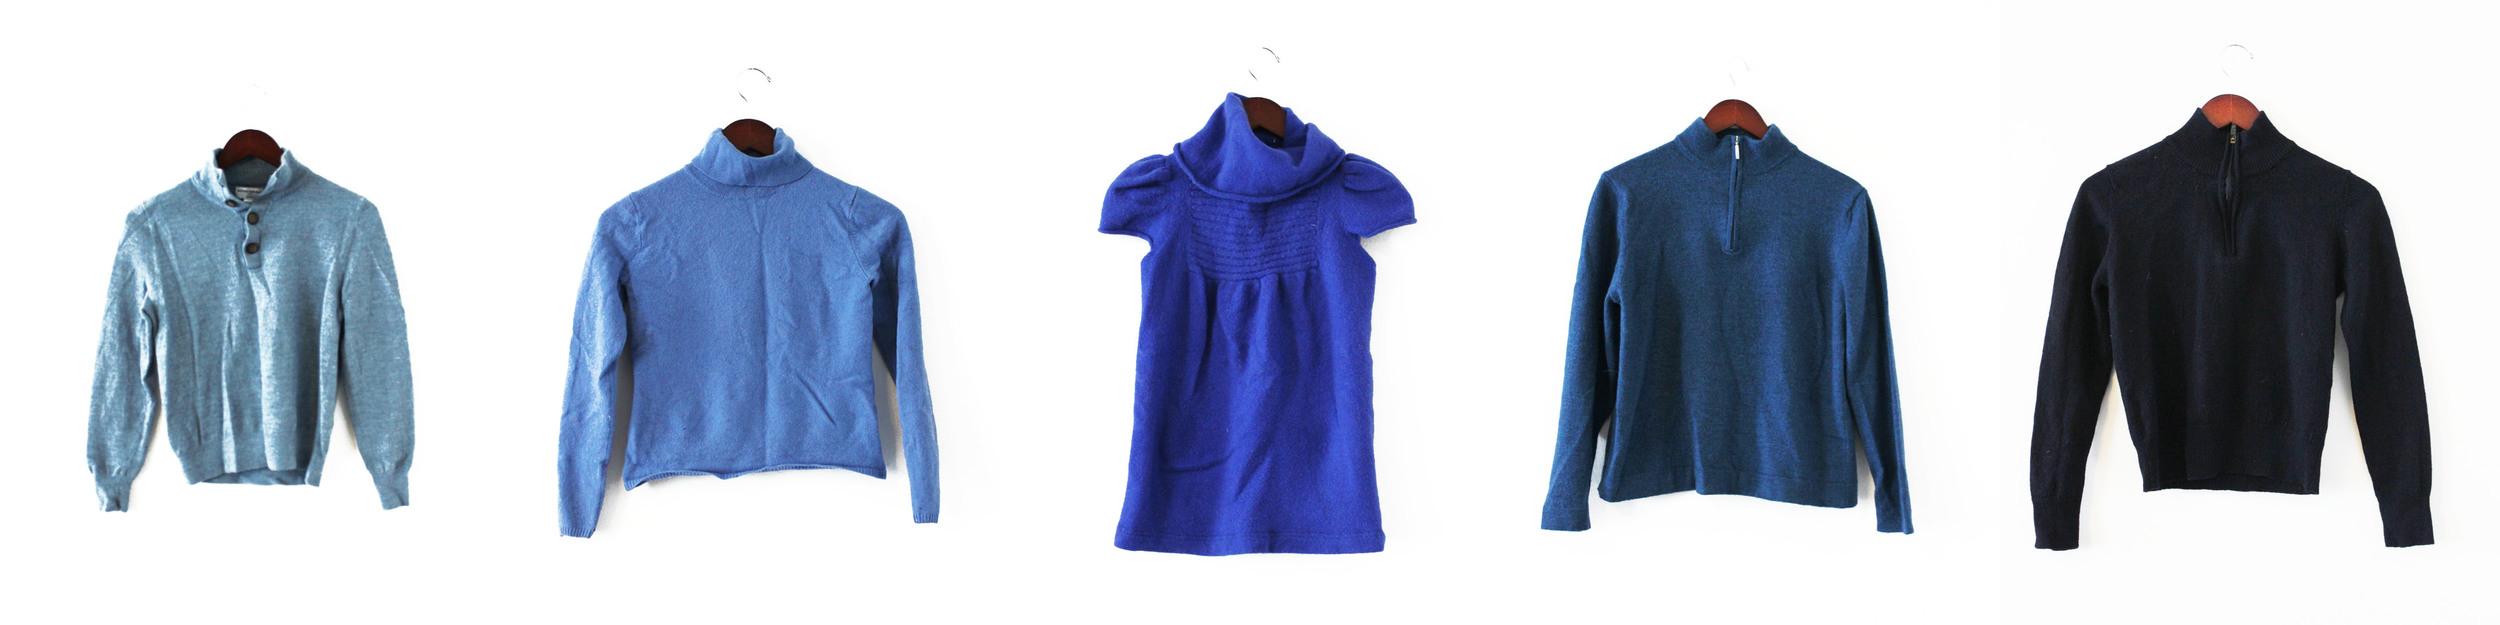 no.10 blue sweaters.jpg